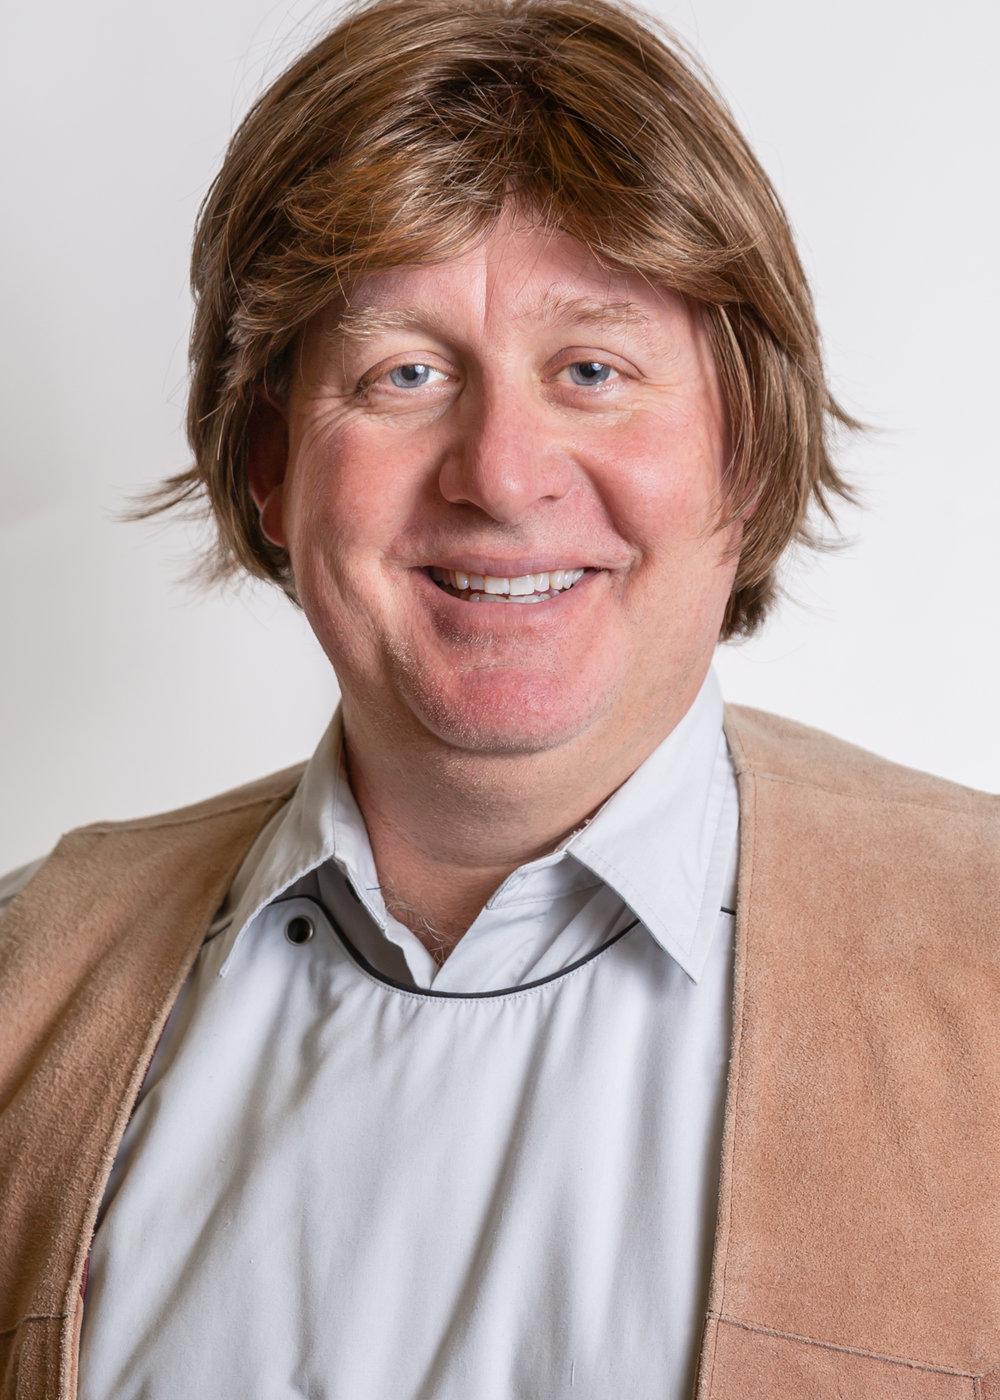 Matt Woodke | Official Builder & Celebrity On staff since 2013